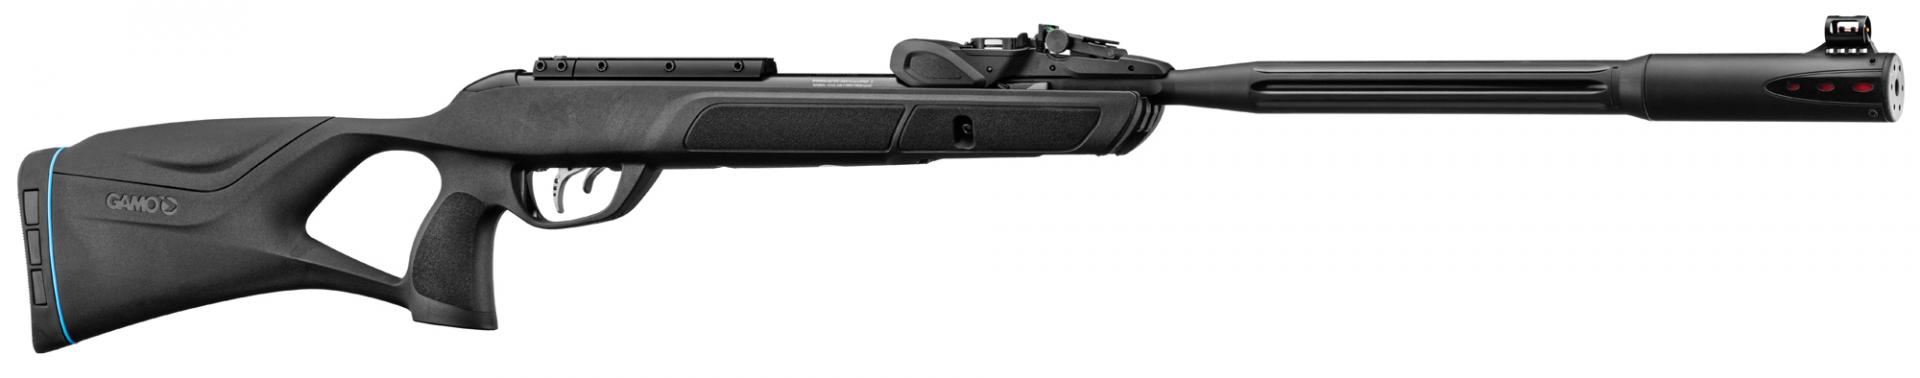 G1399